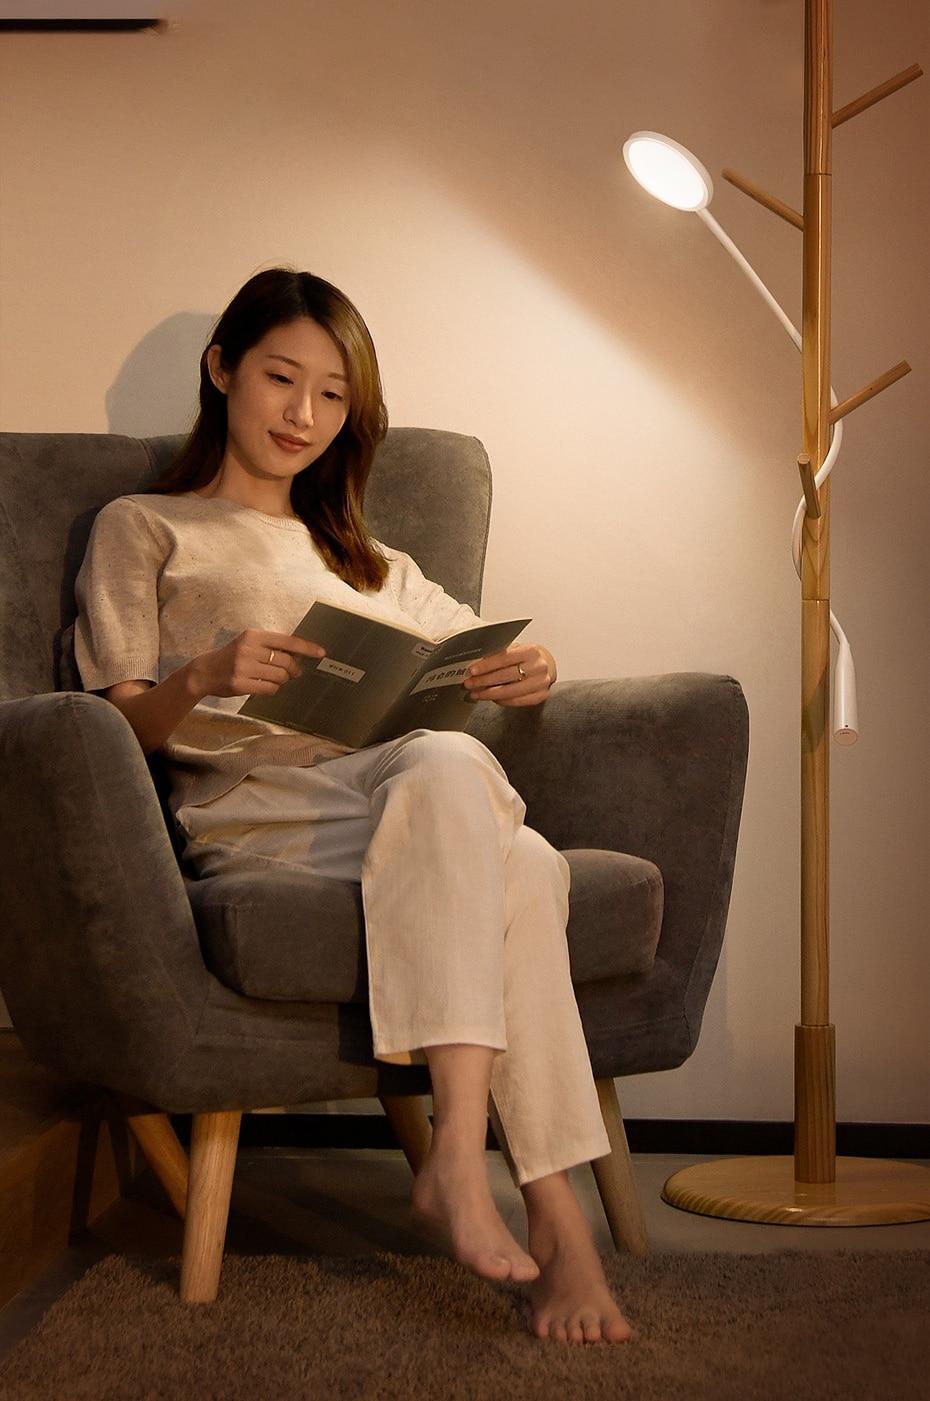 Baseus Comfort Reading Charging Uniform Light Hose Desk Lamp White DGYR-02 13